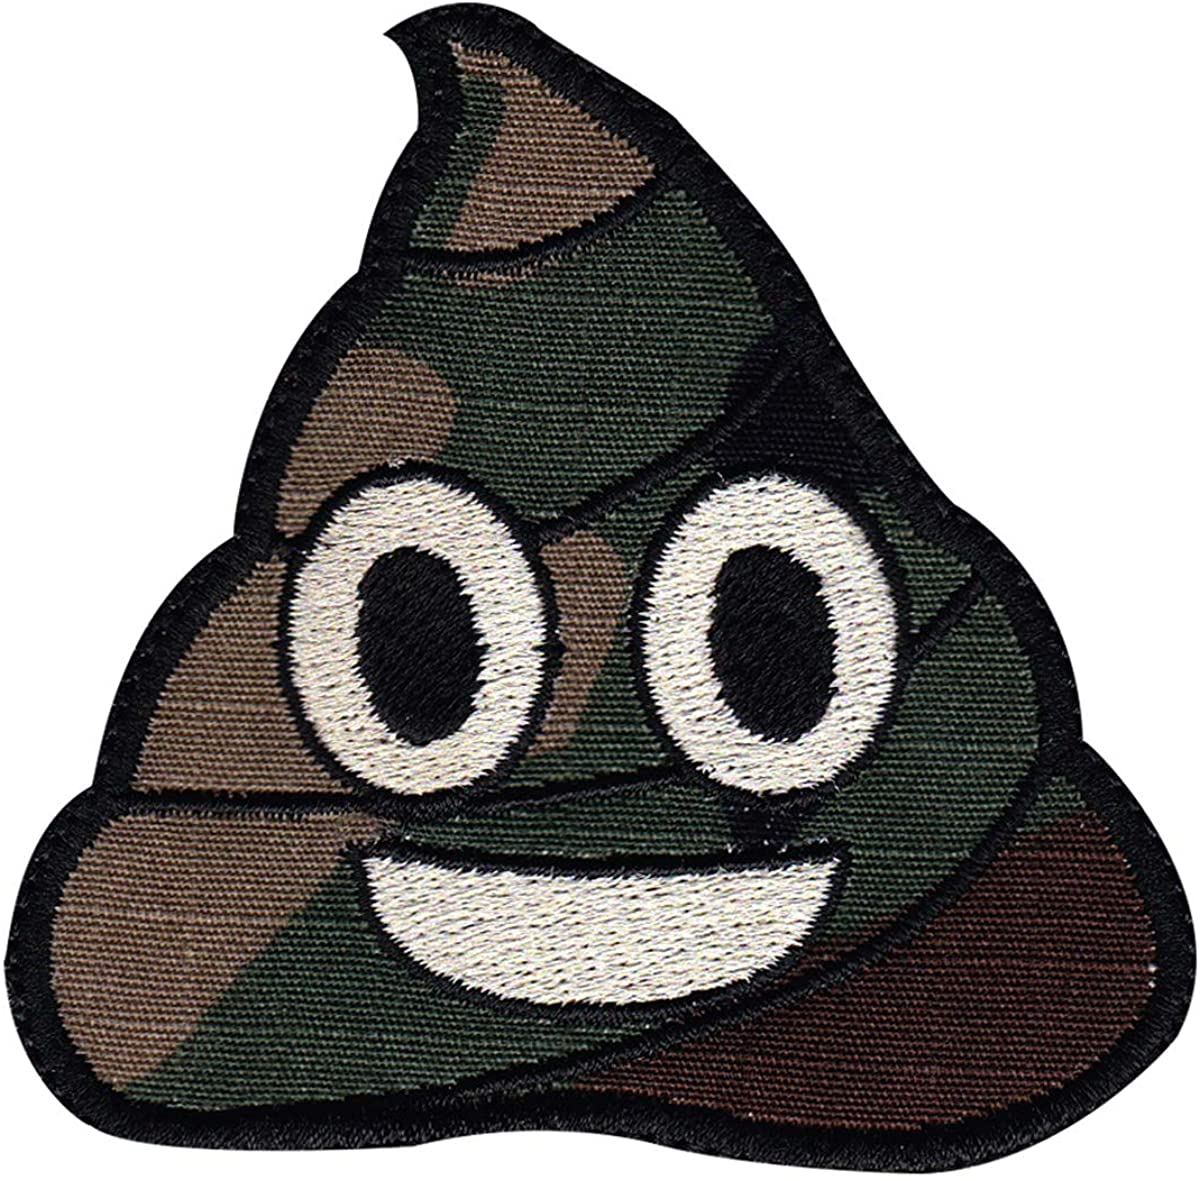 Camo Poo Emoji Patch